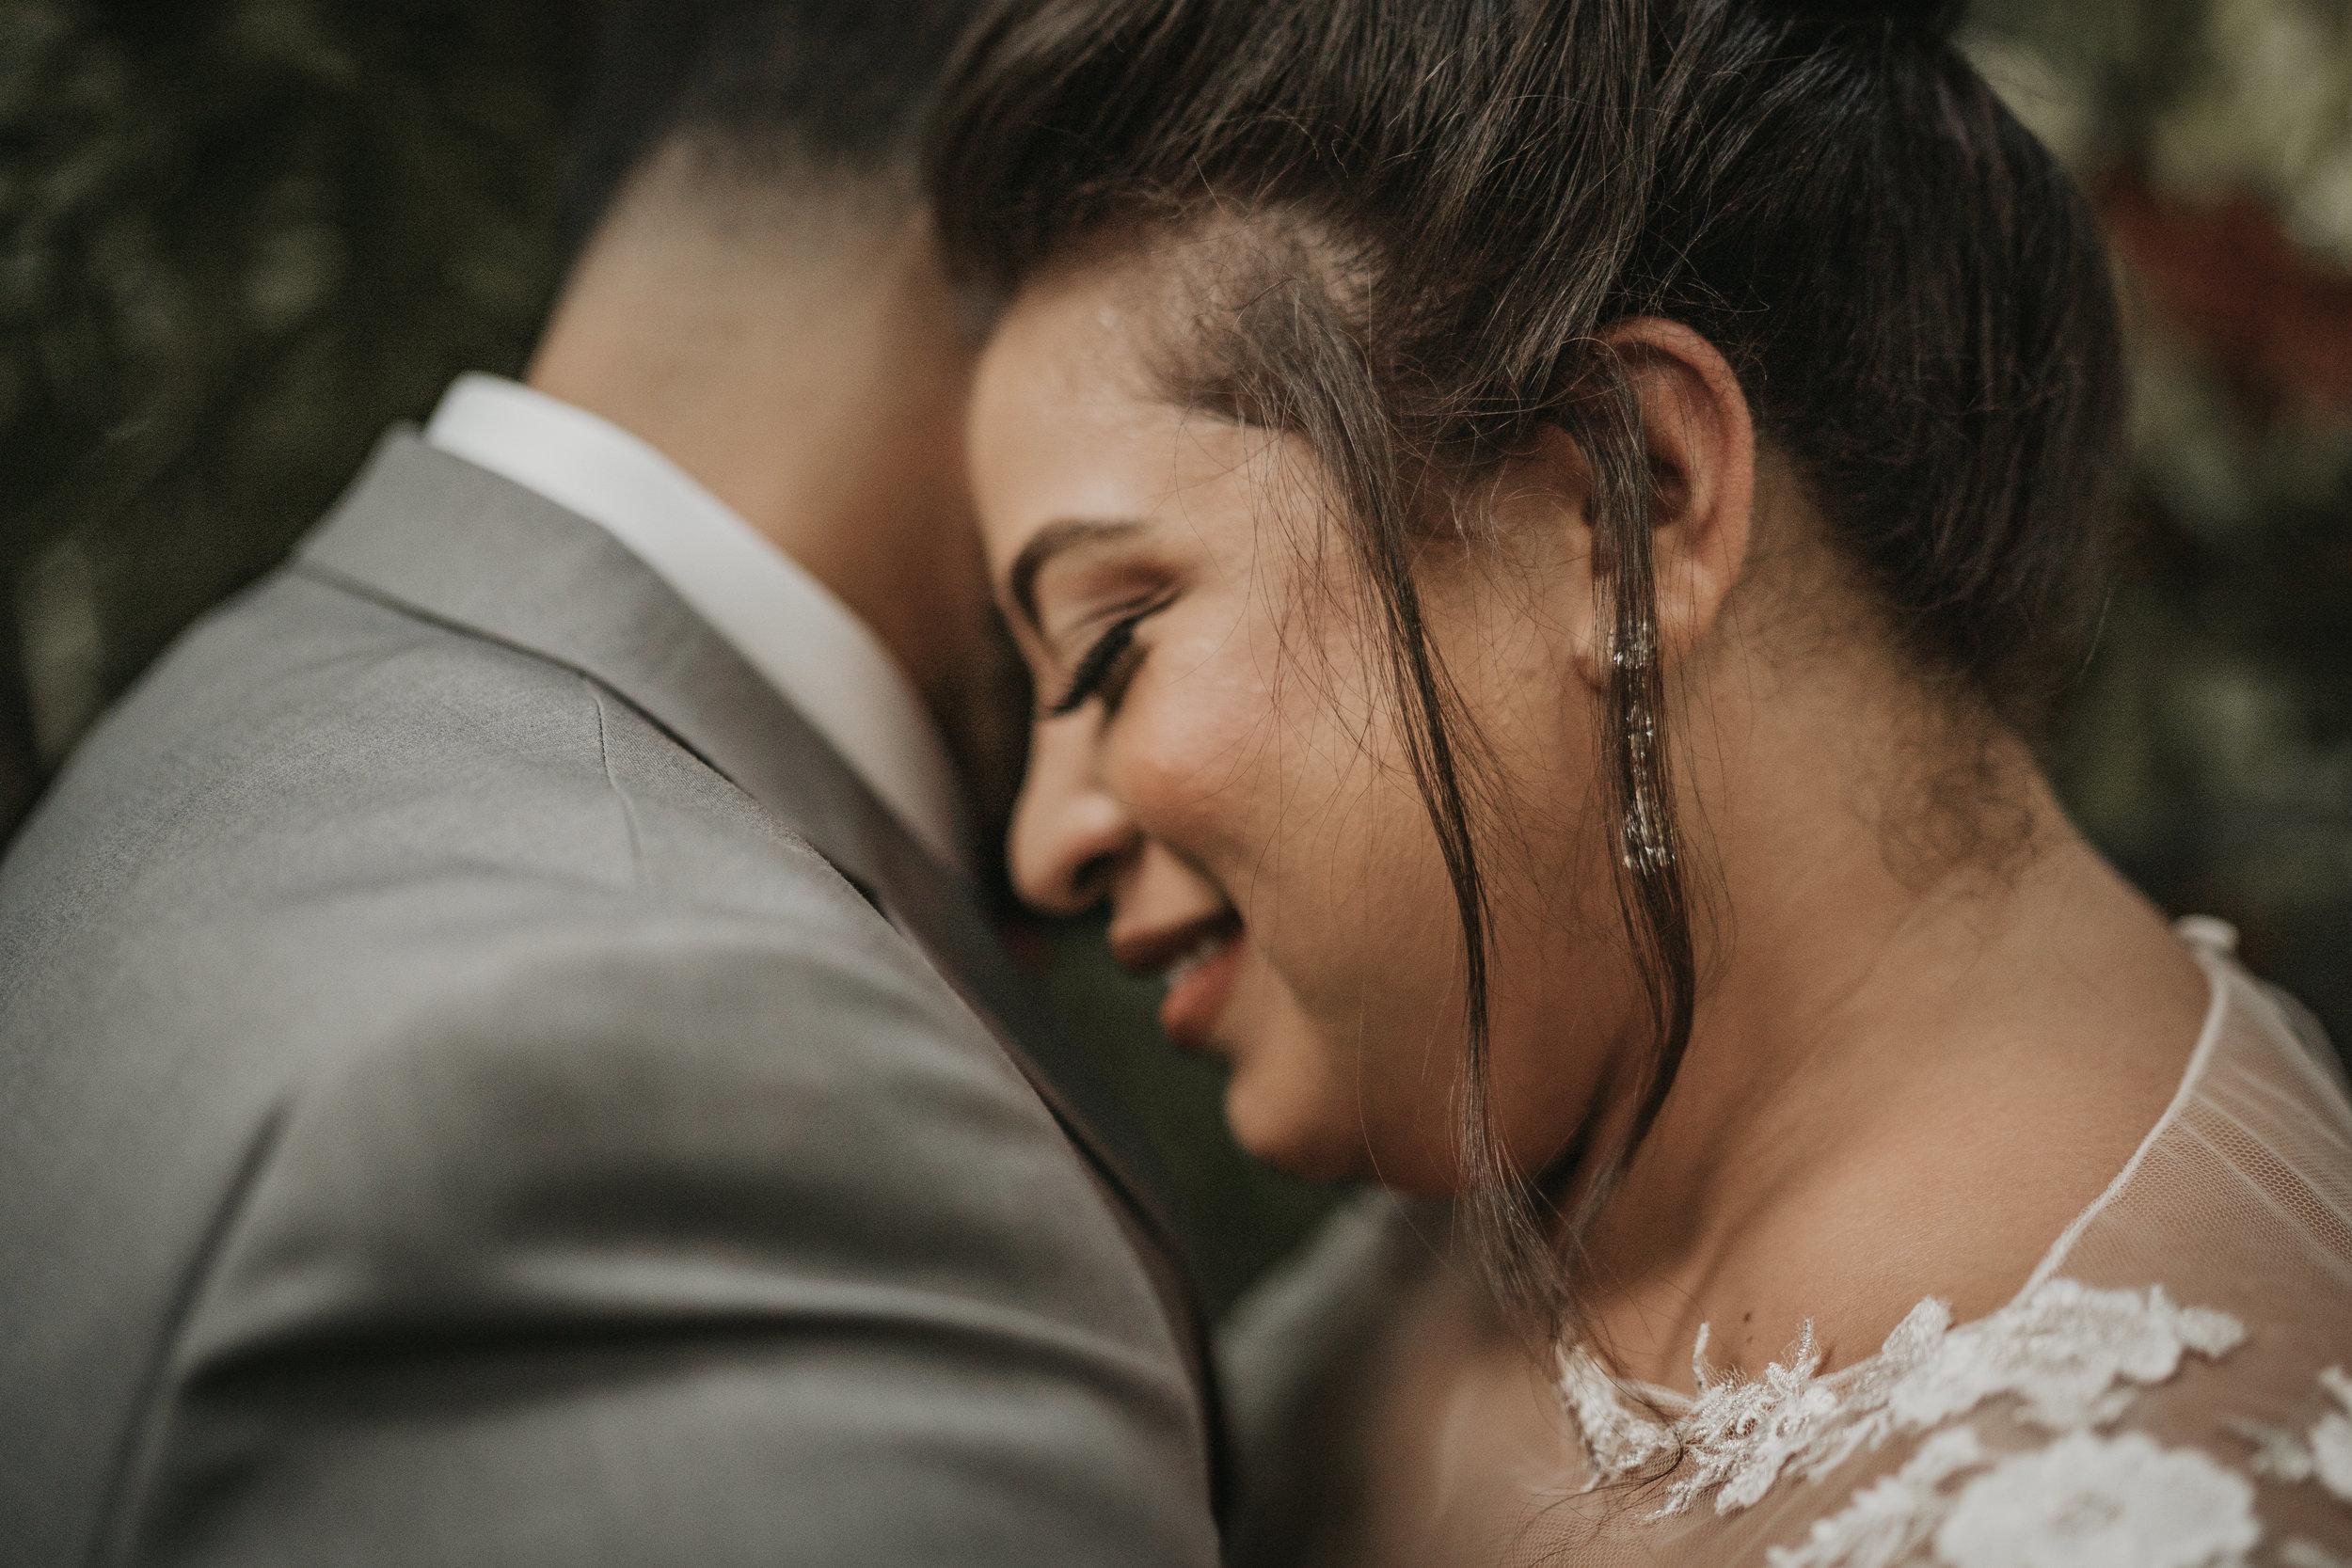 298MICHI&GABEWEDDINGDAY(WeddingFinal).jpg